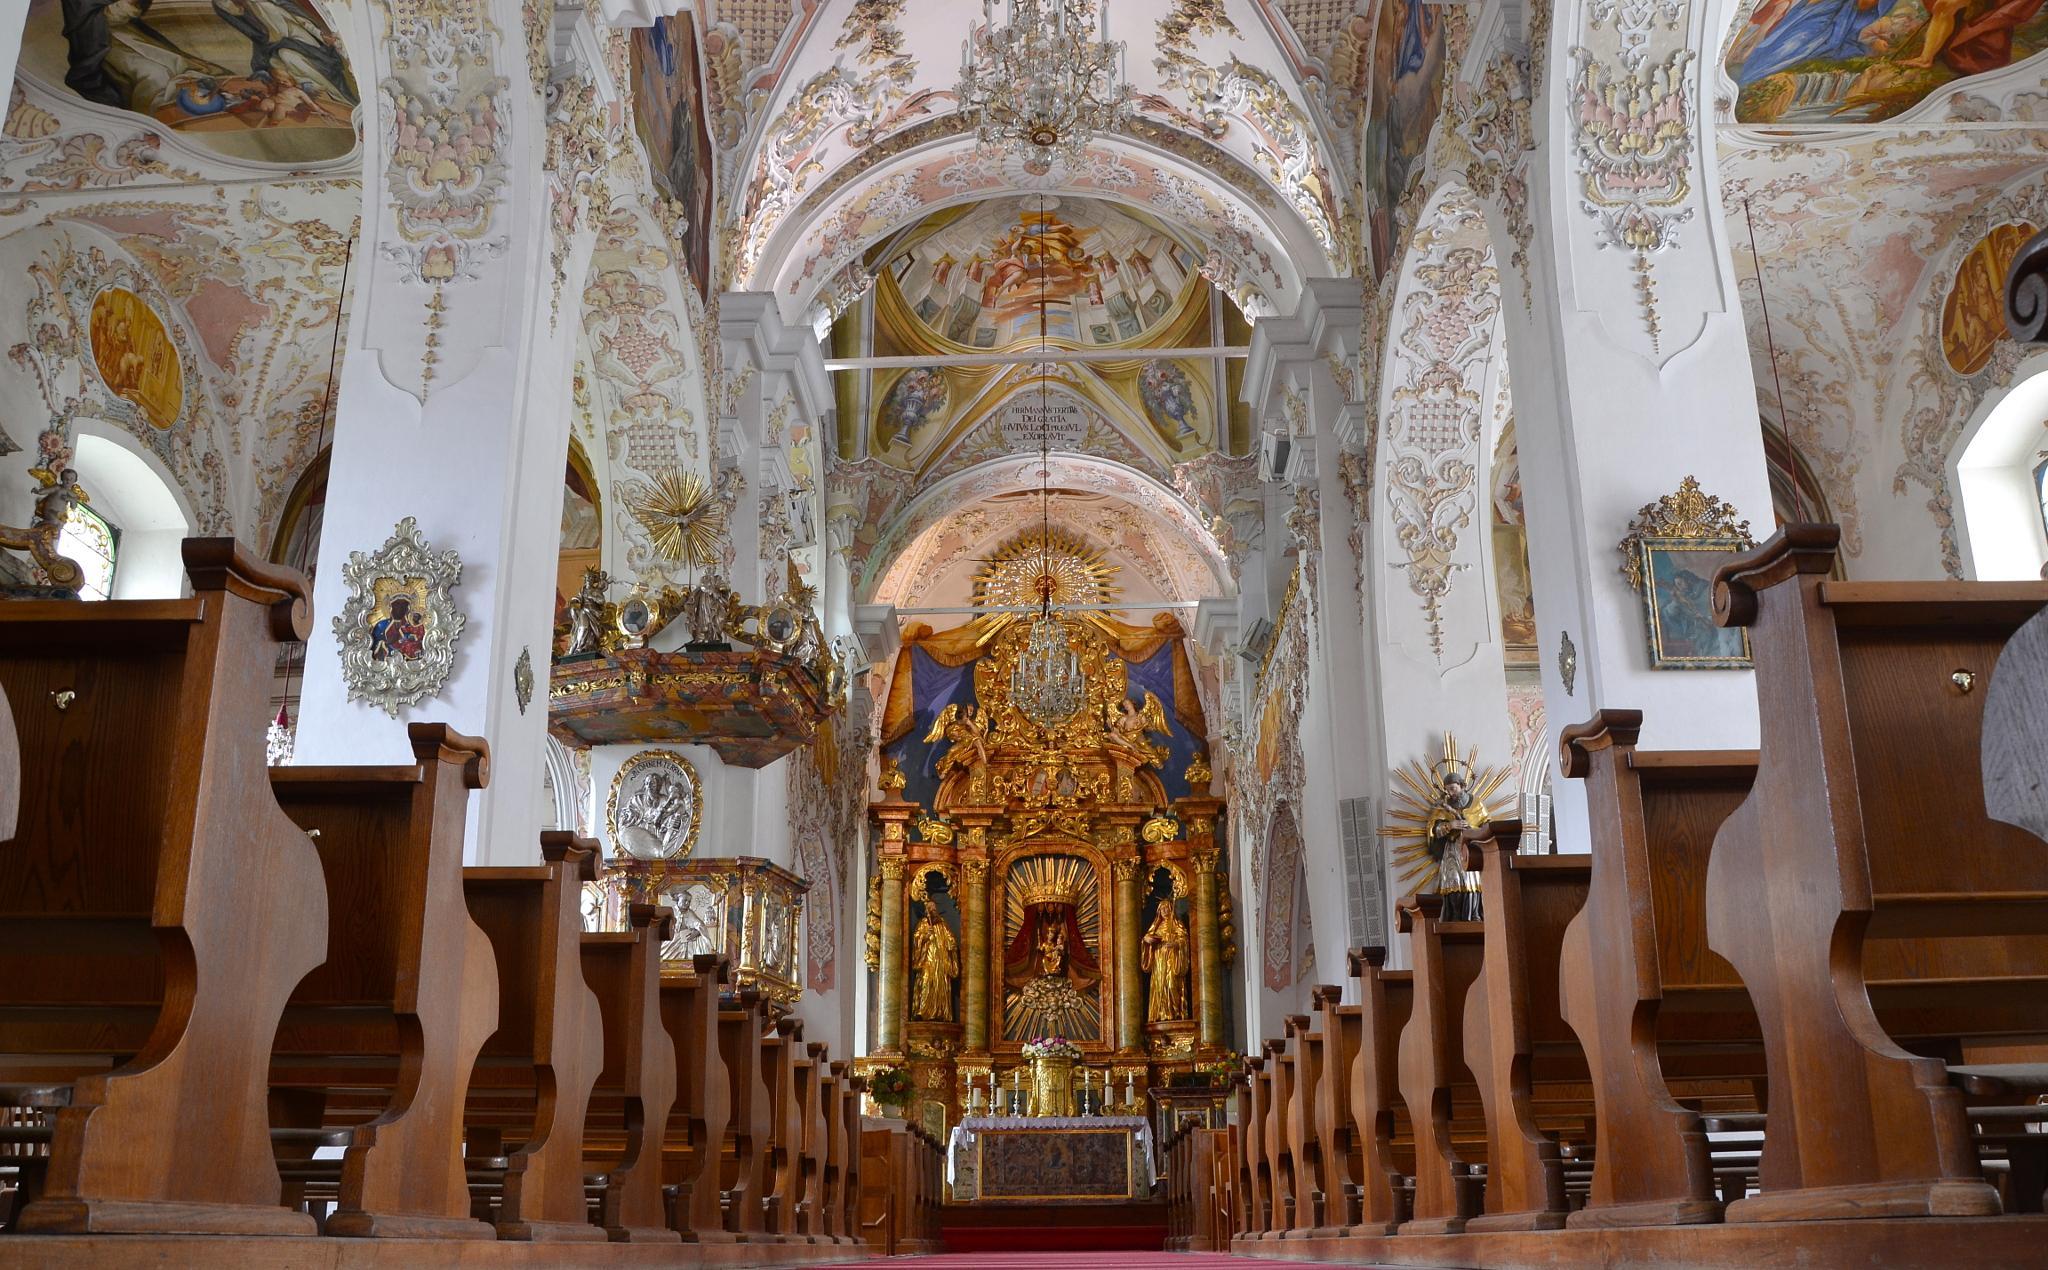 The collegial church of Ossiach by echumachenco